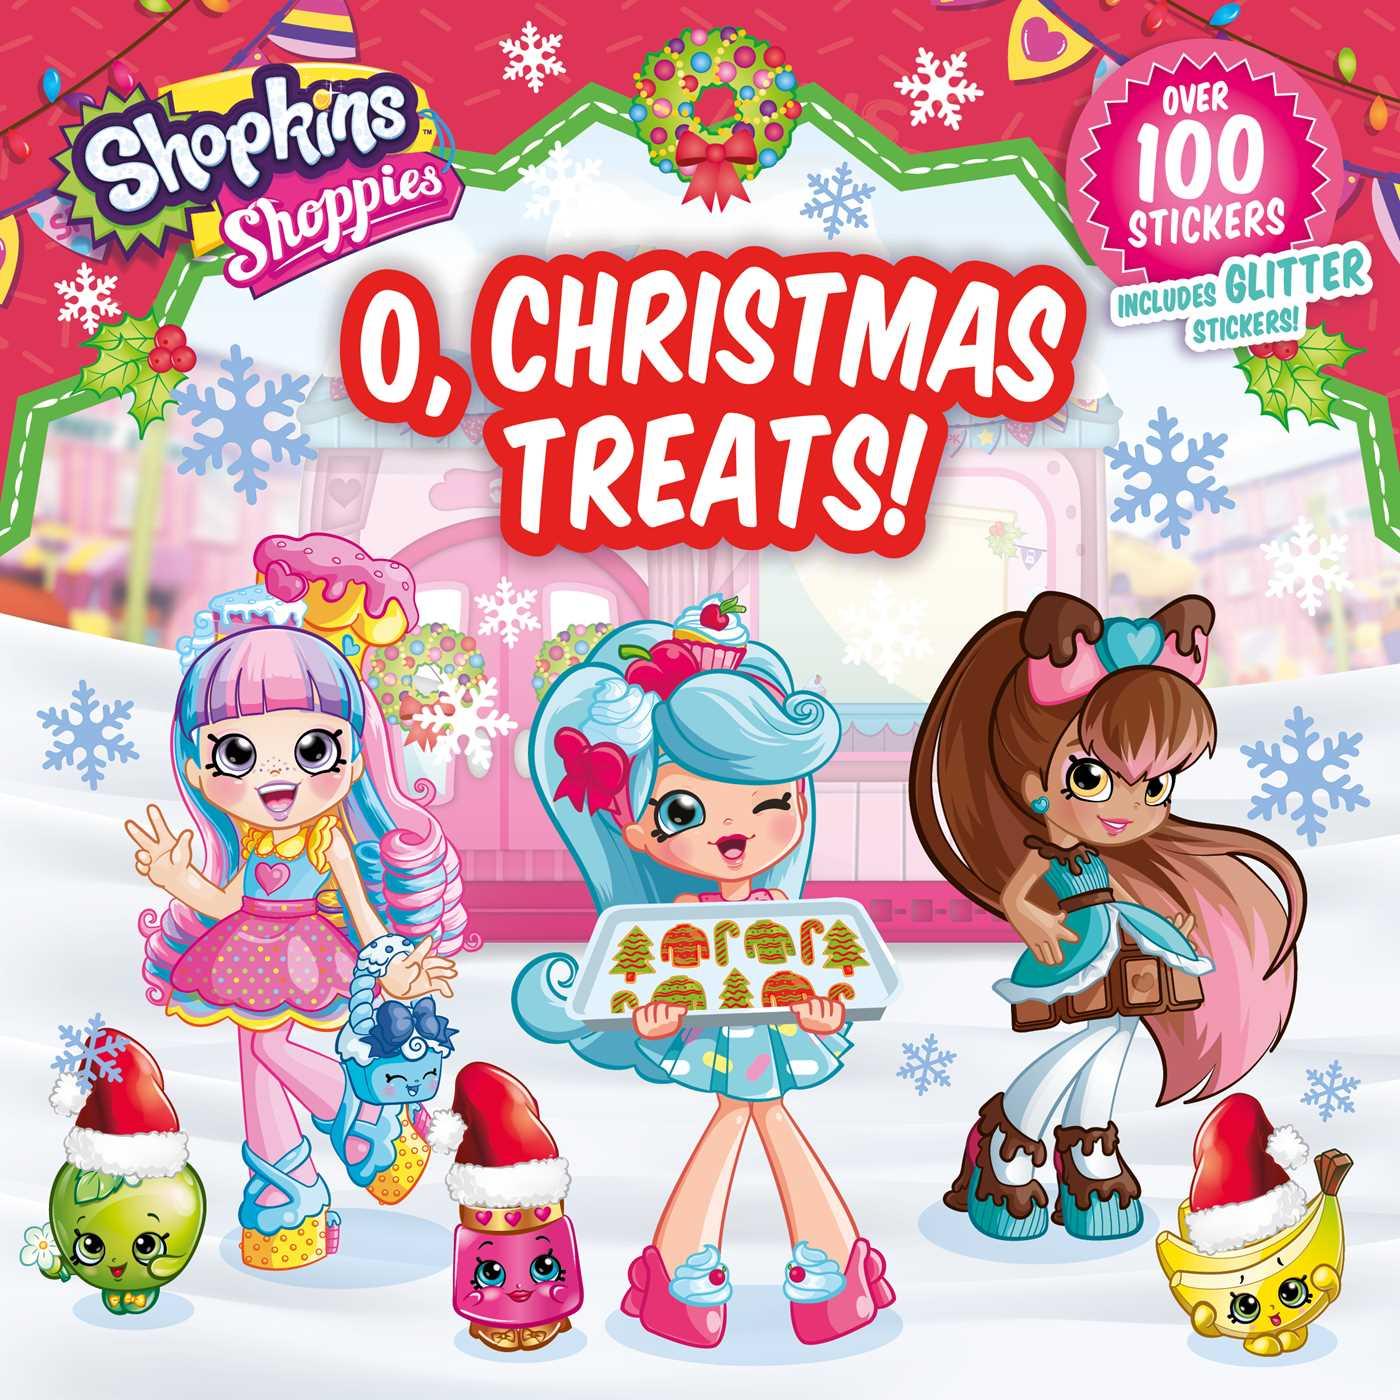 Shoppies o christmas treats 9781499807837 hr